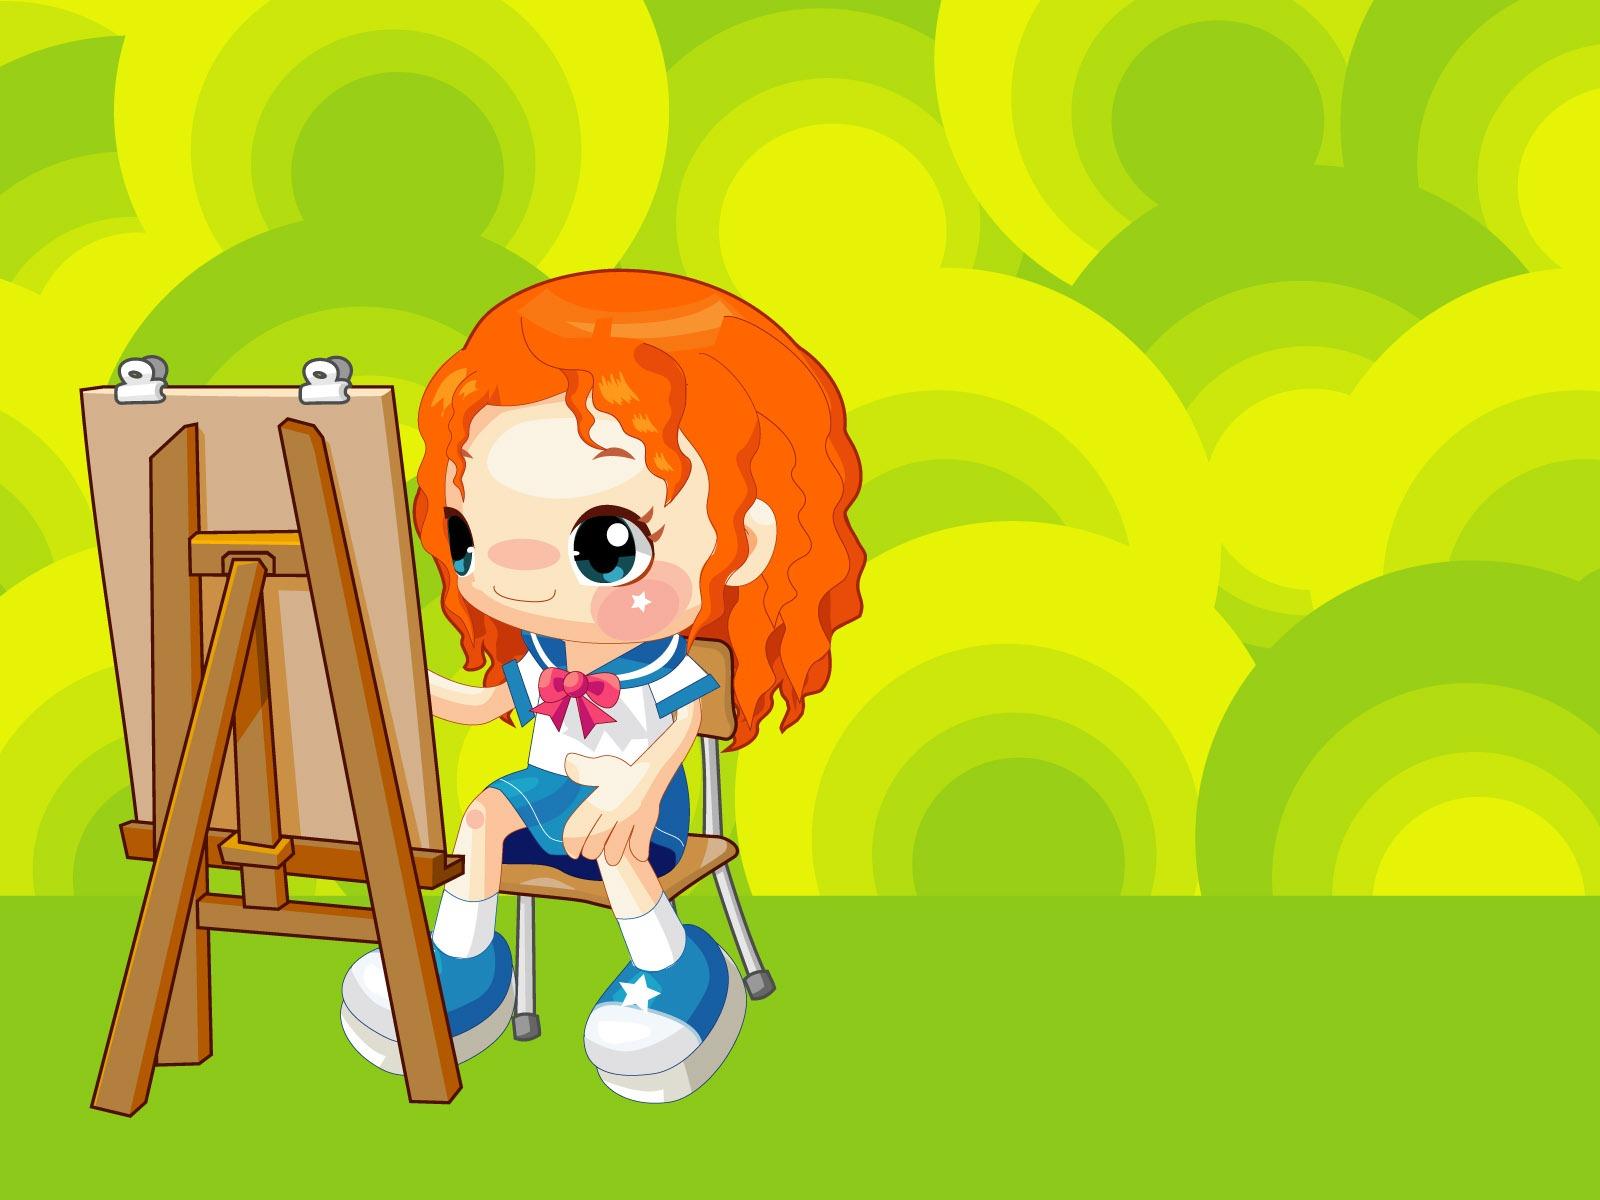 Wallpaper Hd 4k Dibujos Animados Infantiles Fondos De Vectores 1 9